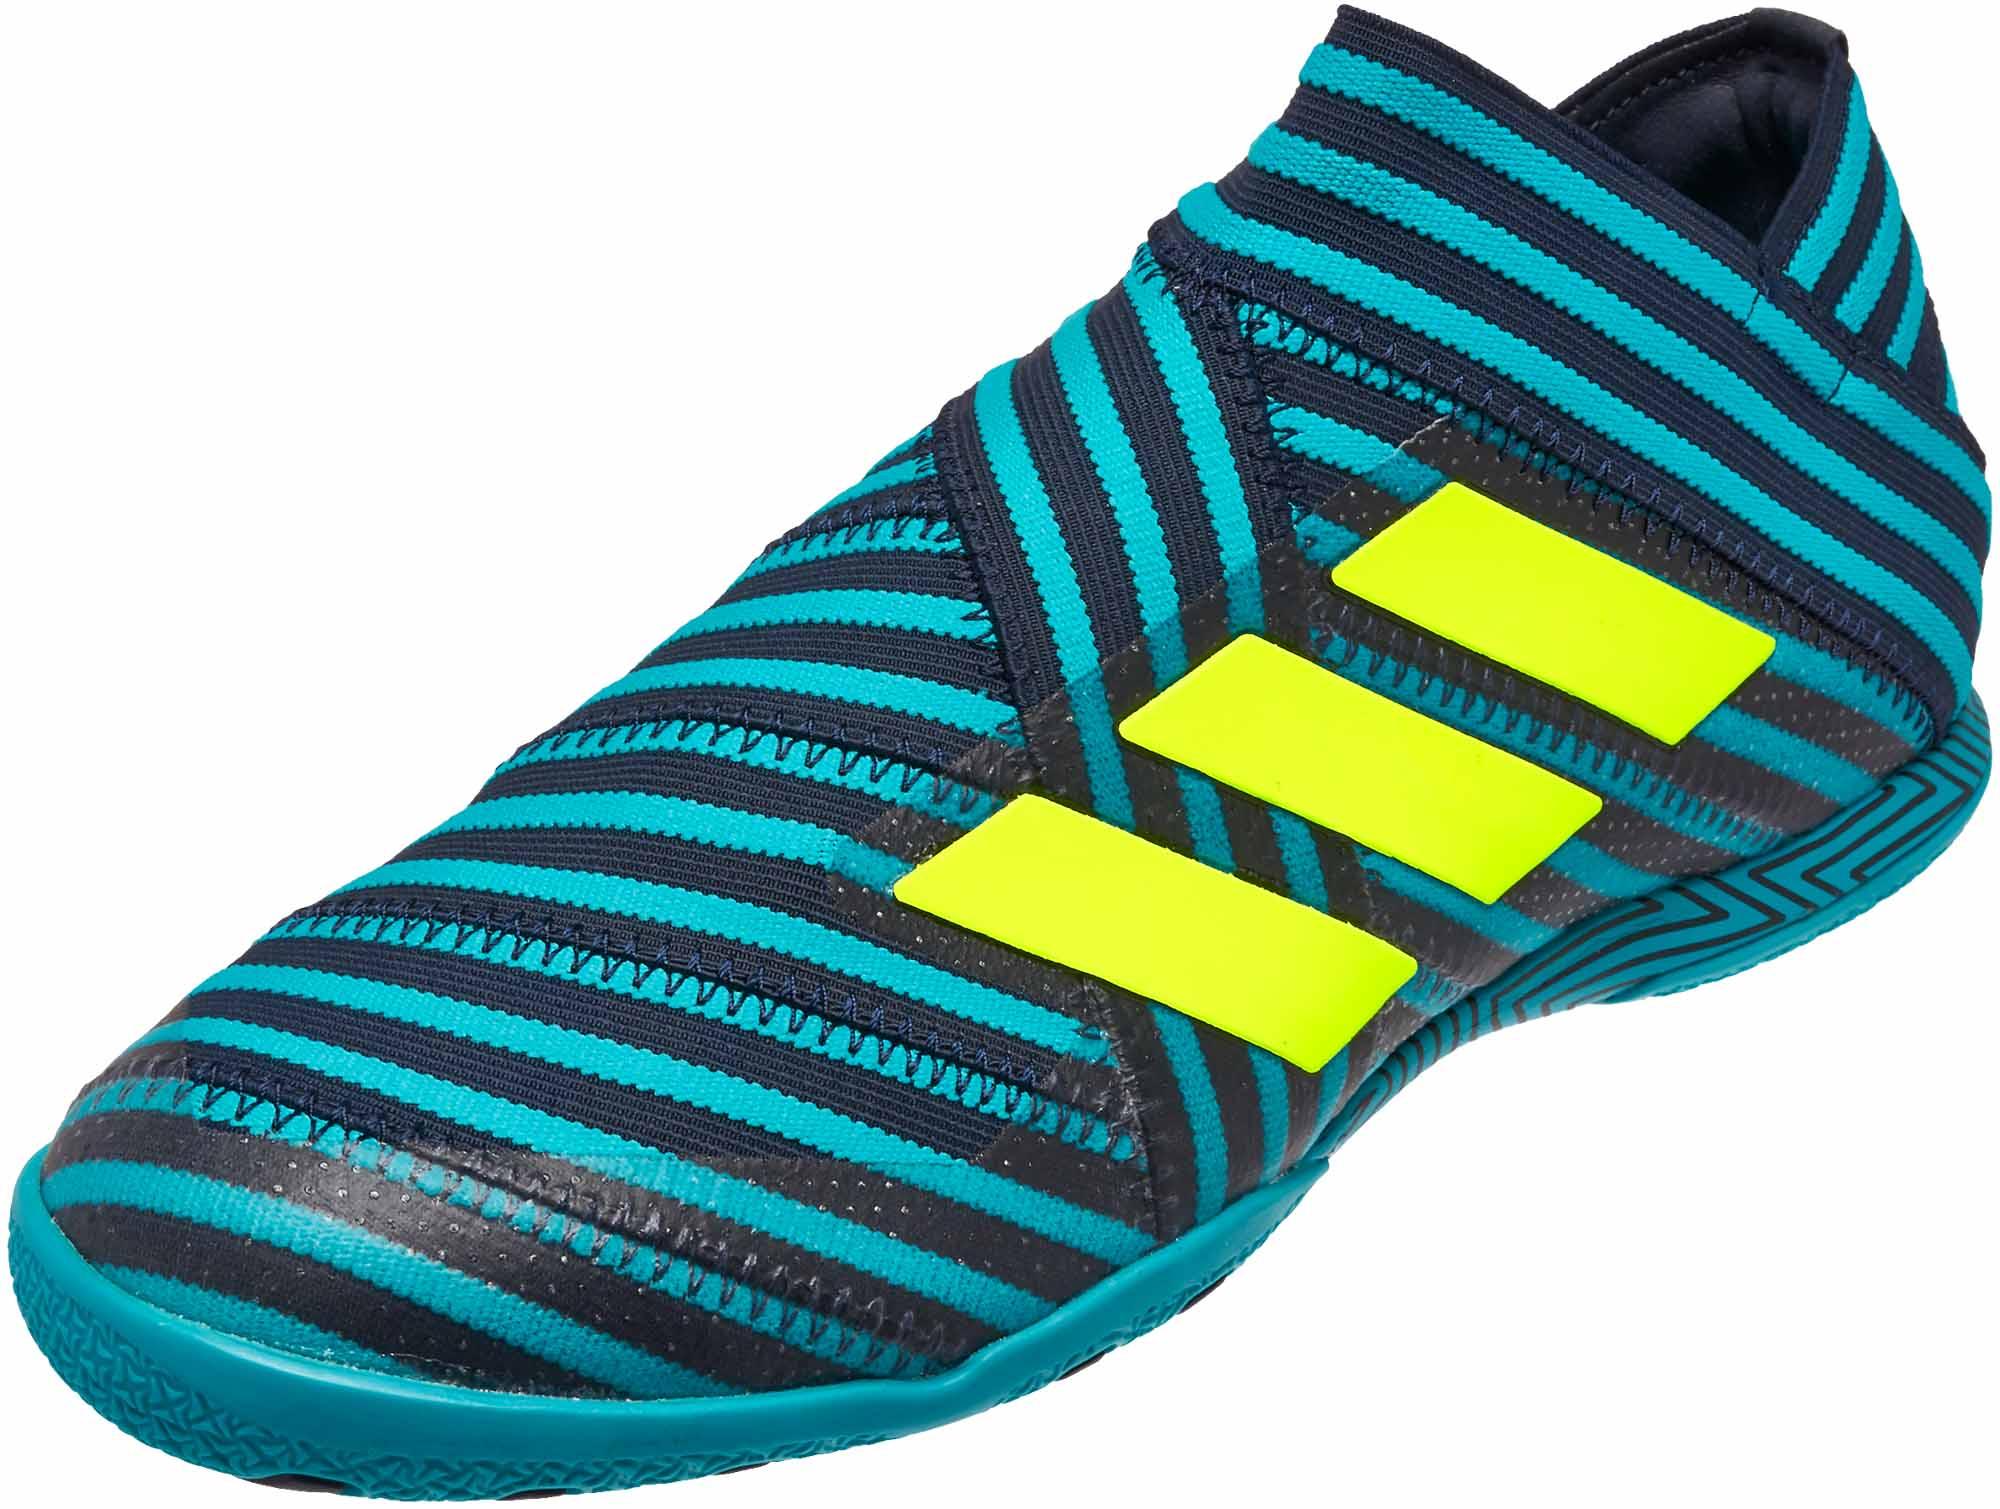 603c153a2ca3 adidas Nemeziz Tango 17 360Agility – Legend Ink Solar Yellow